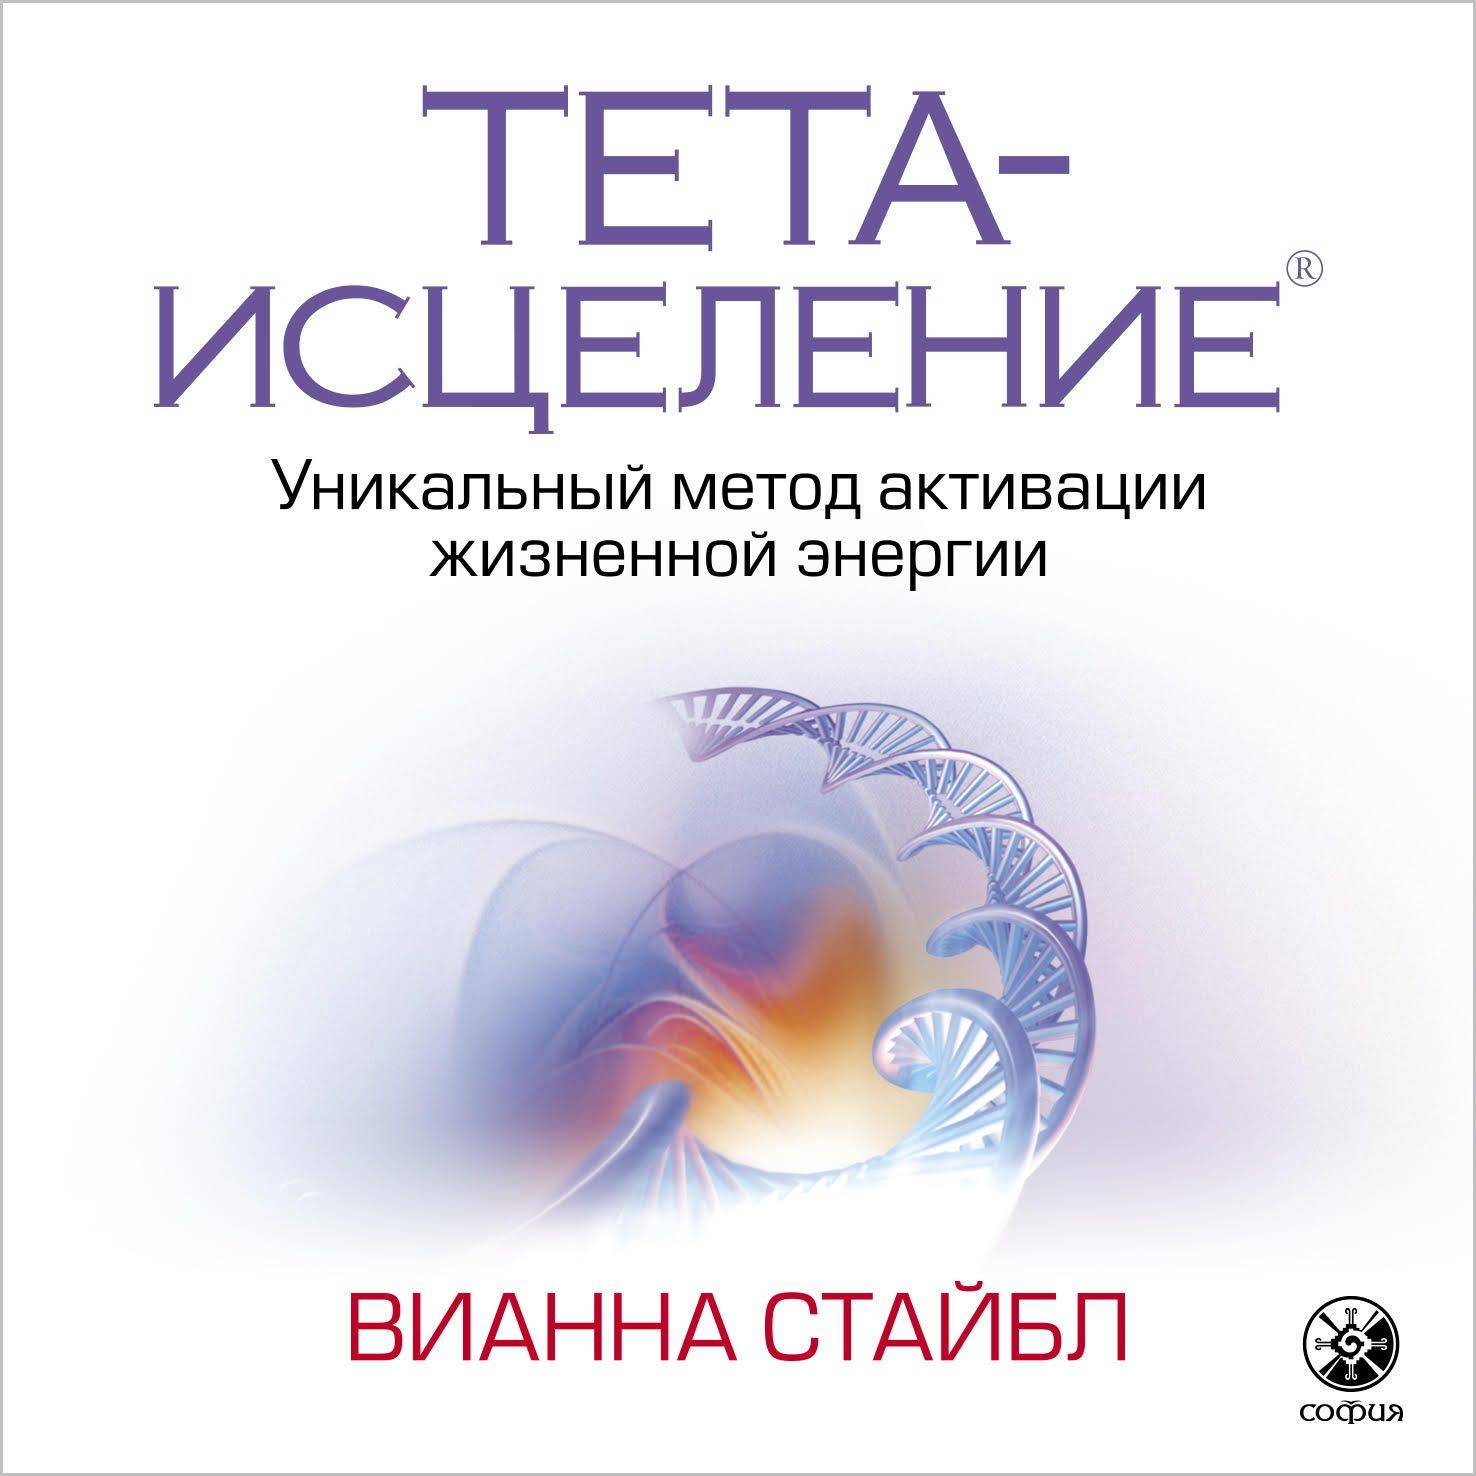 Тета хилинг медитация - техника выполнения и преимущества